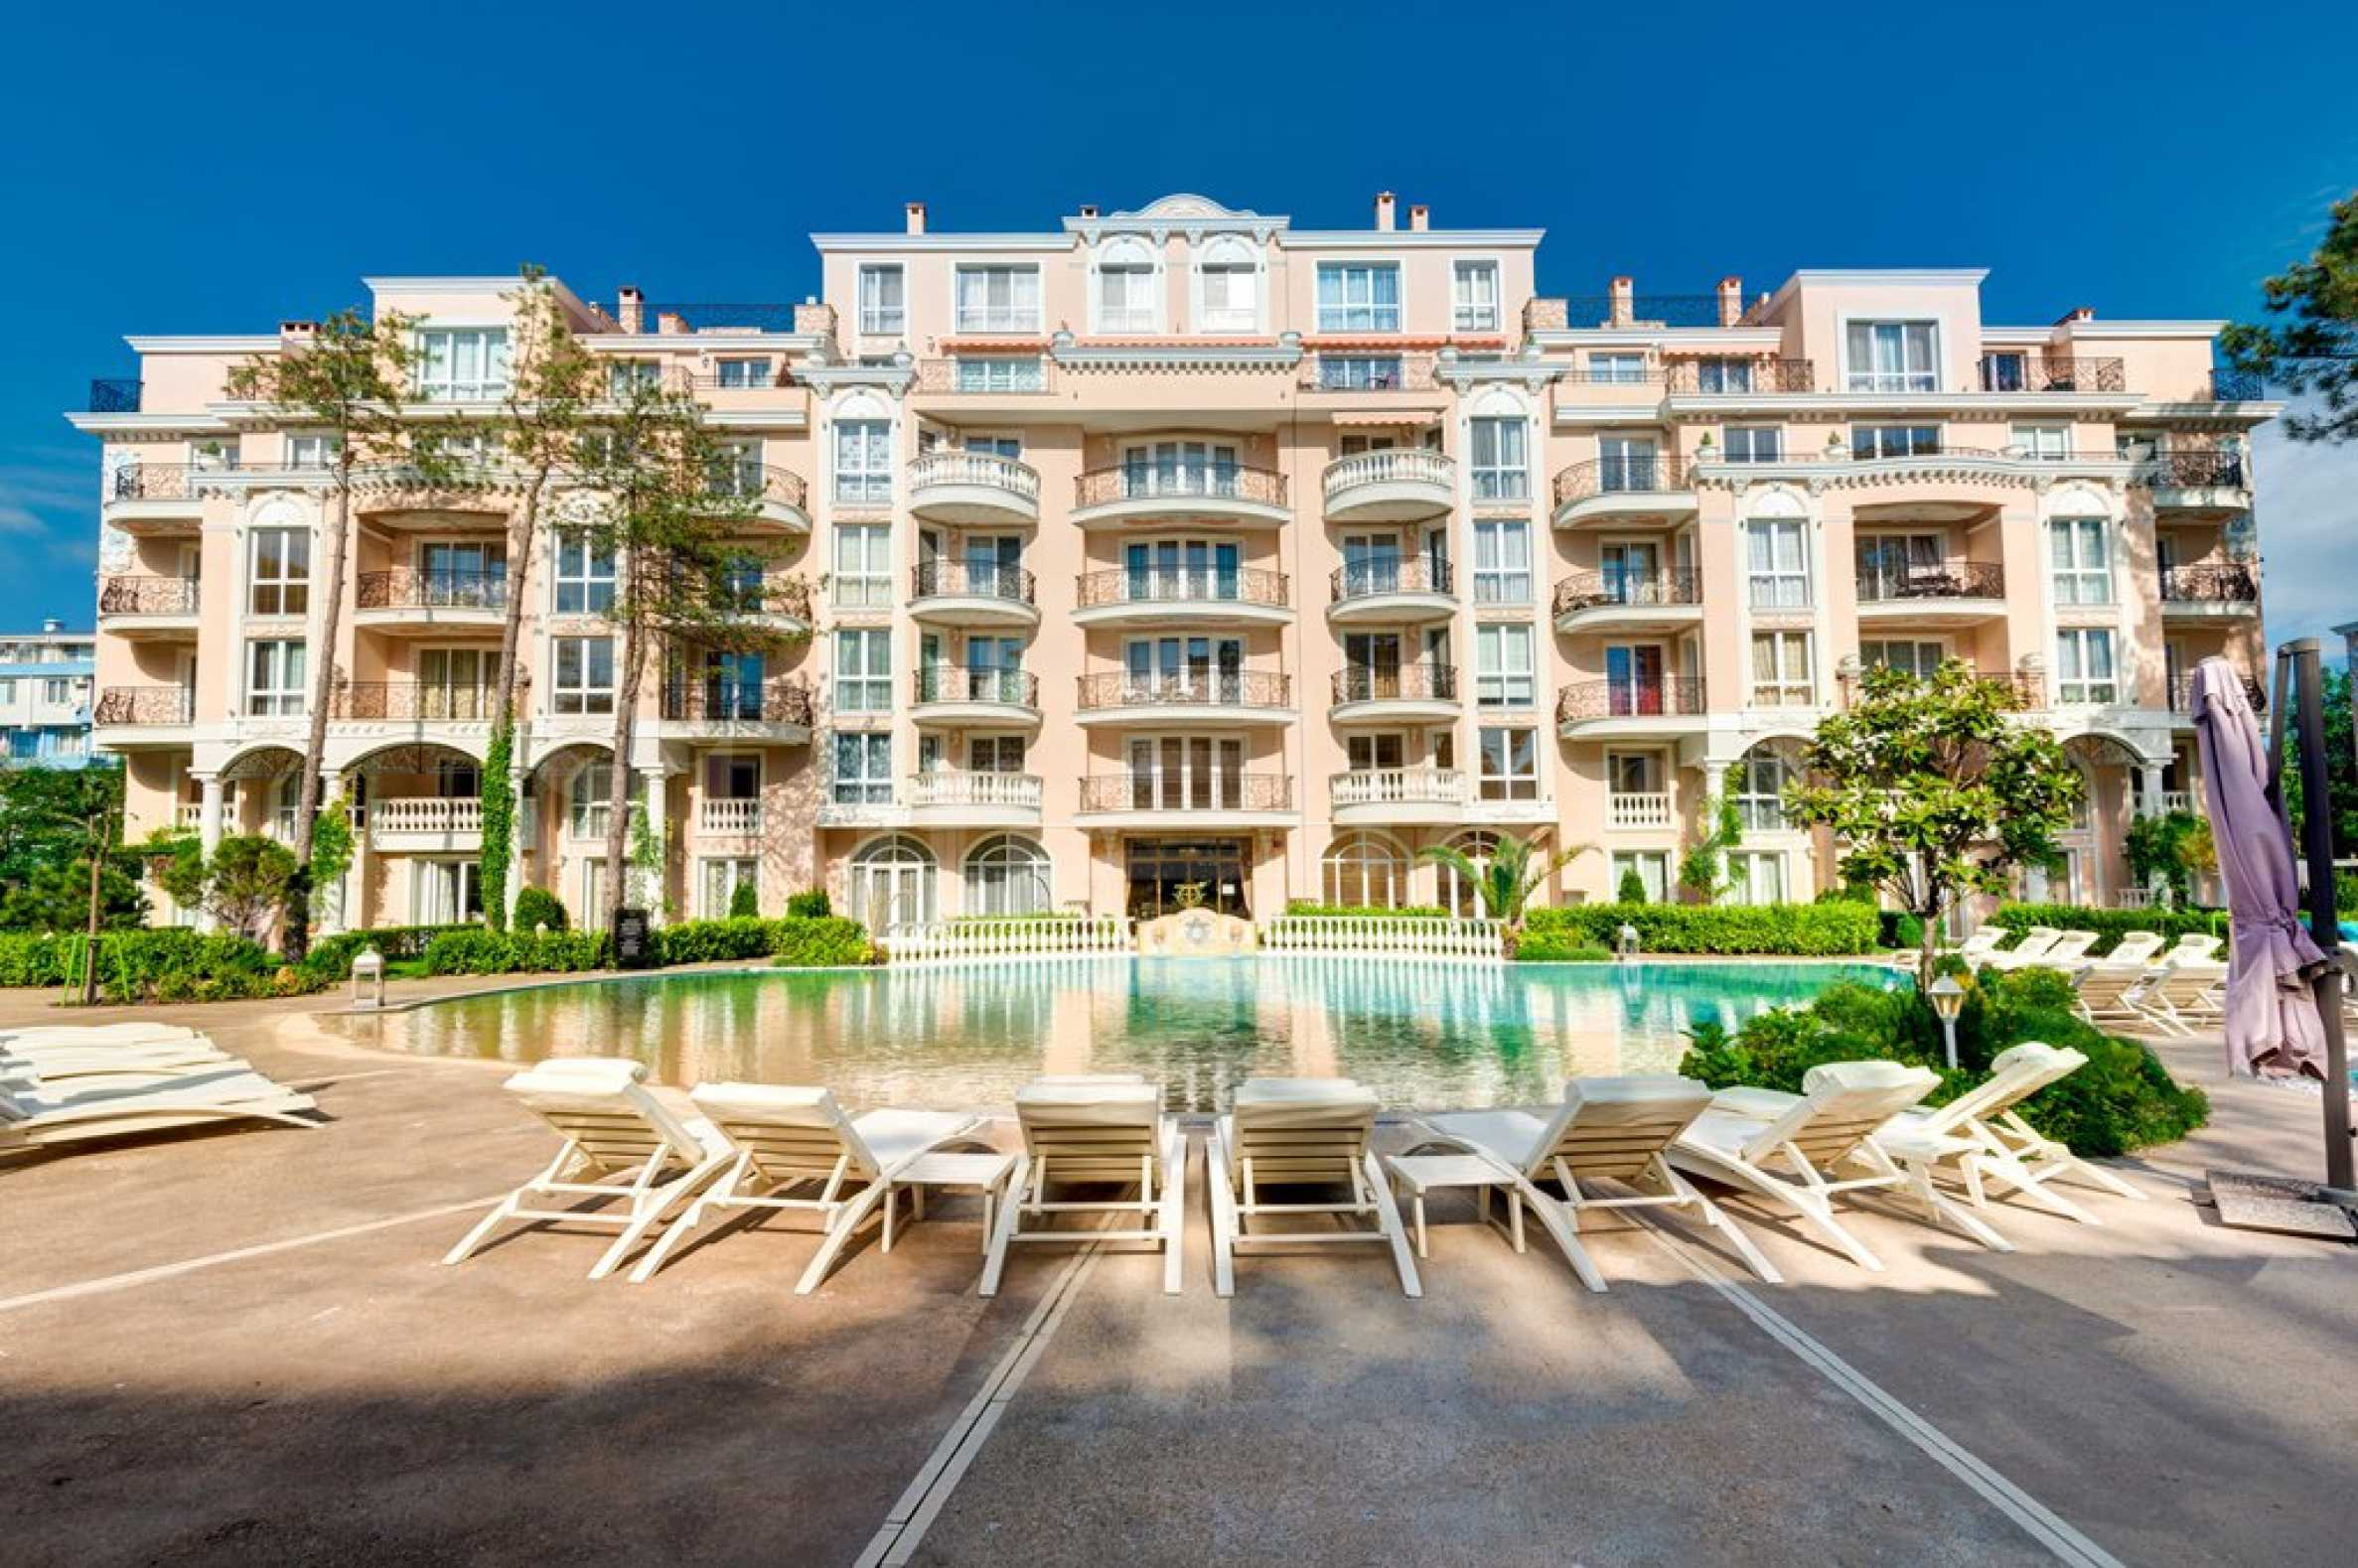 Apartment in Sunny Beach1 - Stonehard